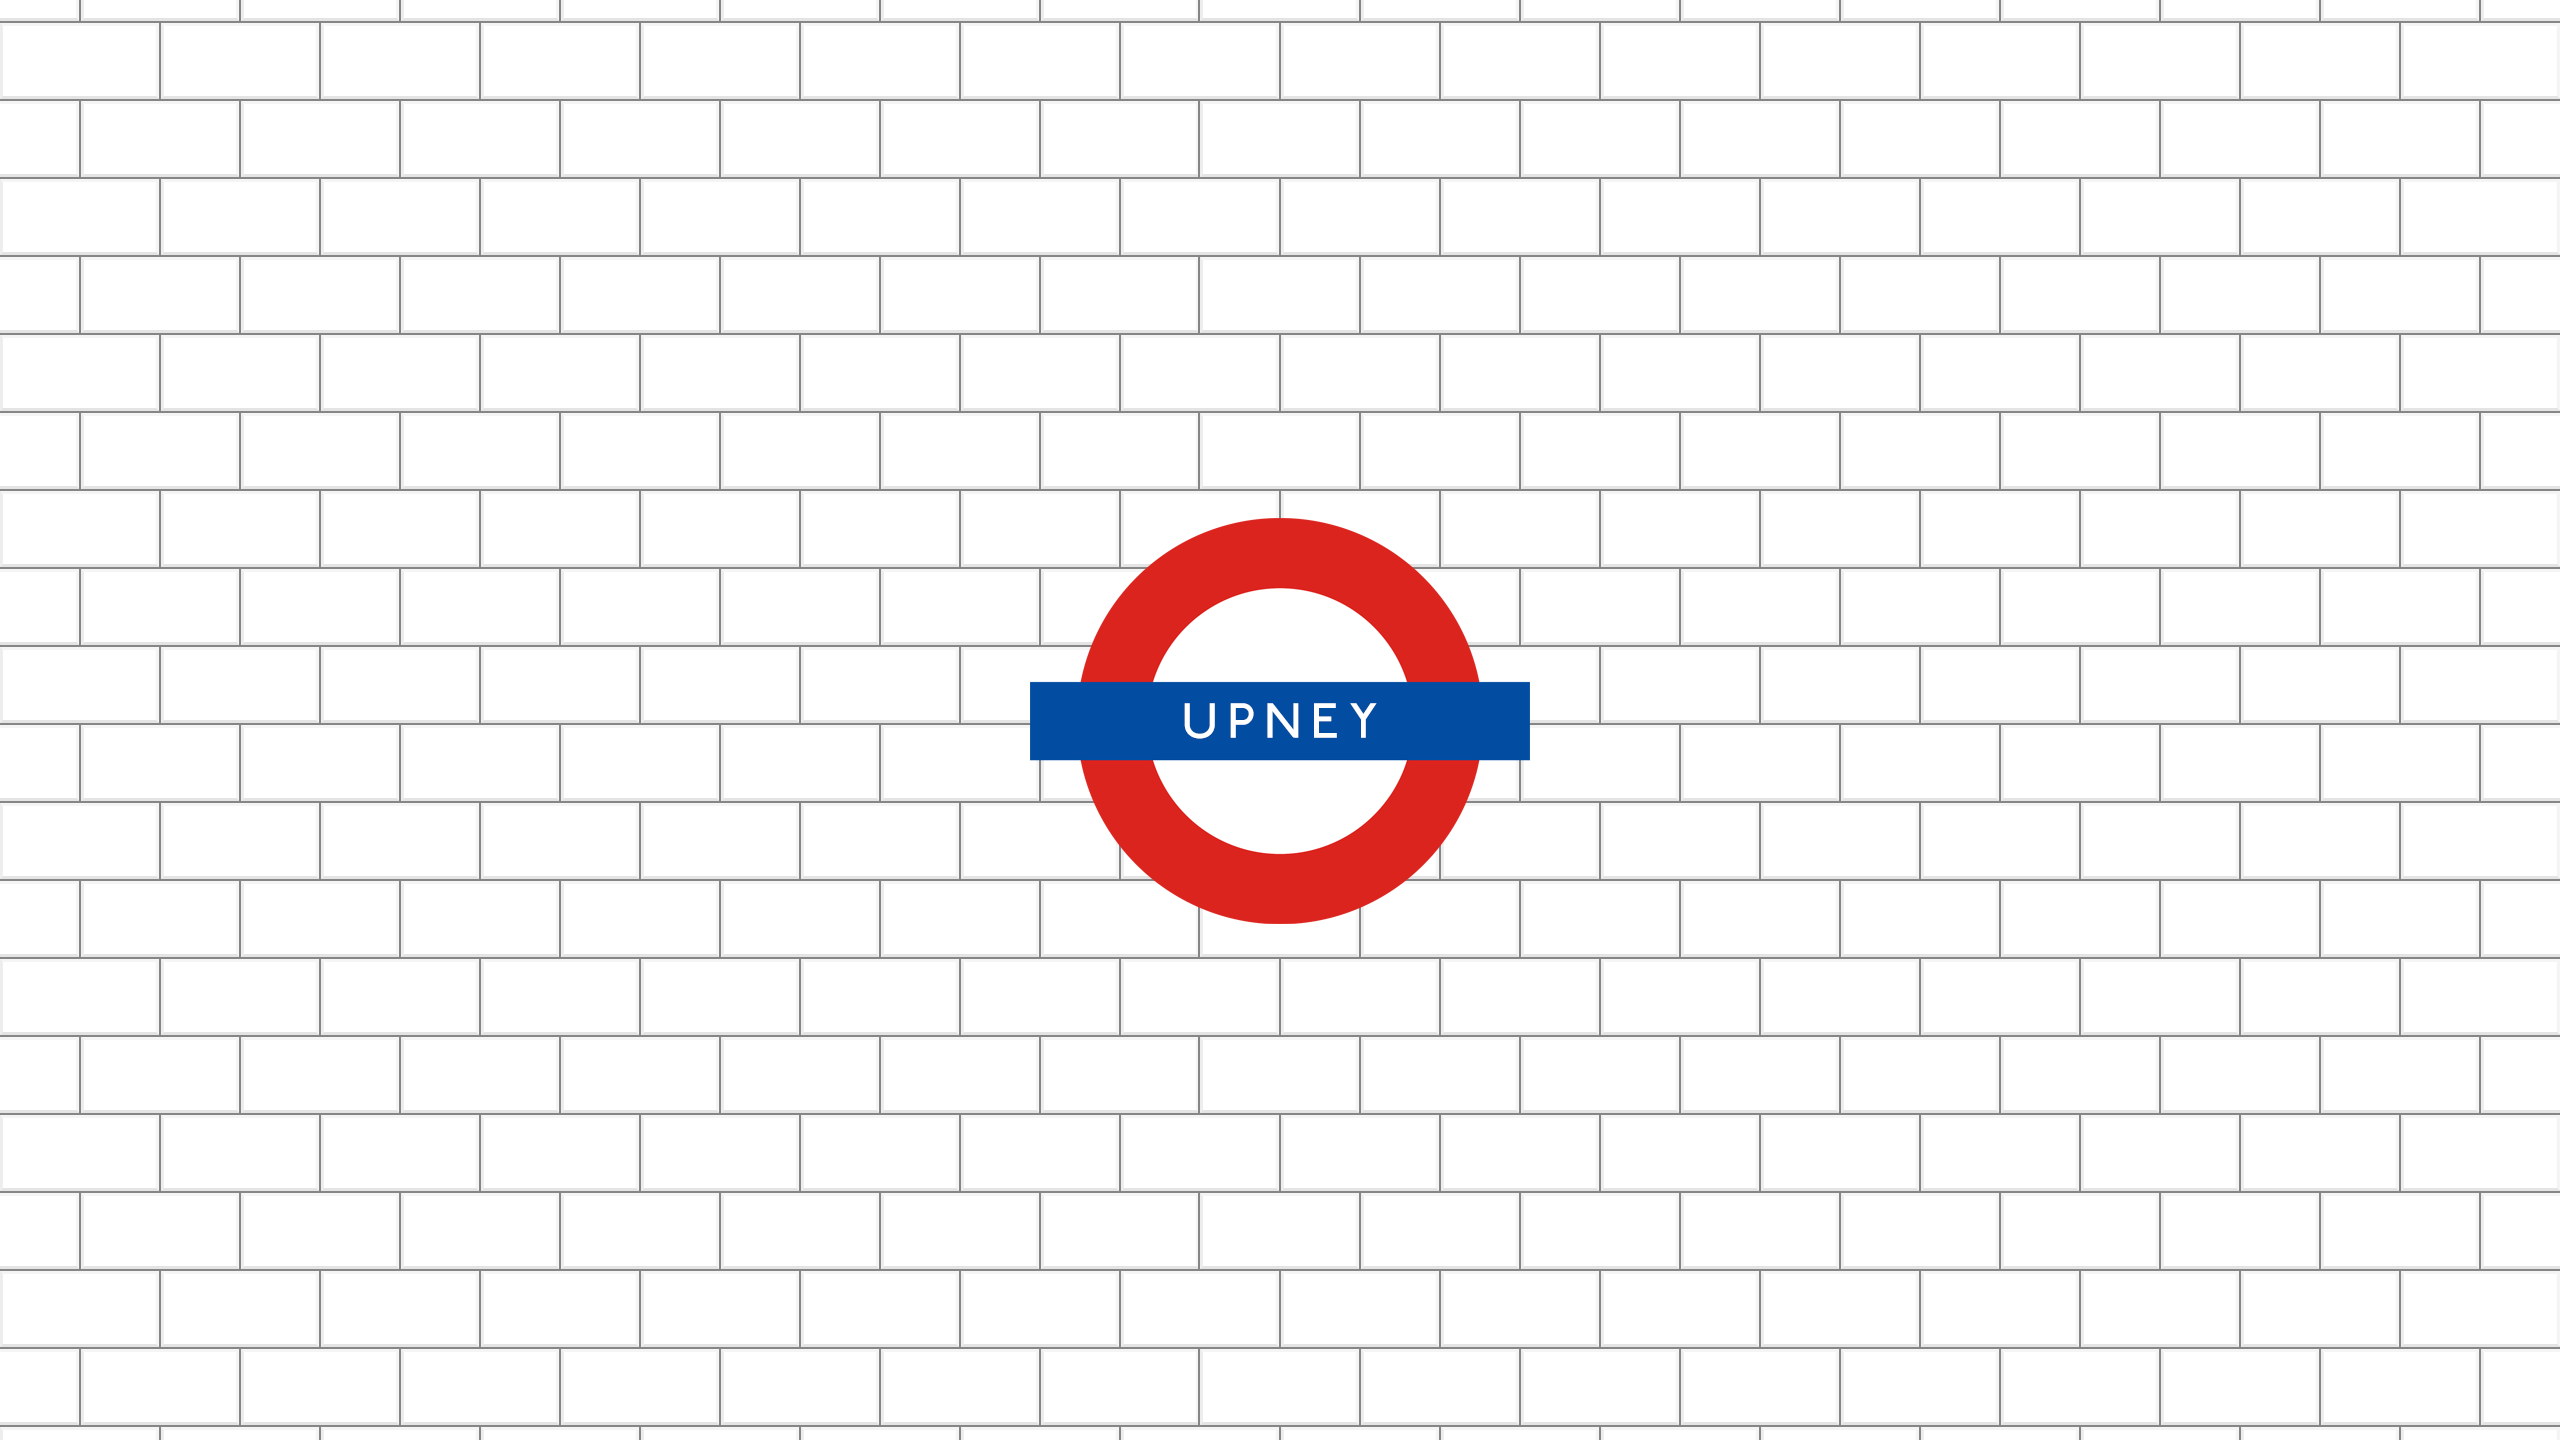 Upney